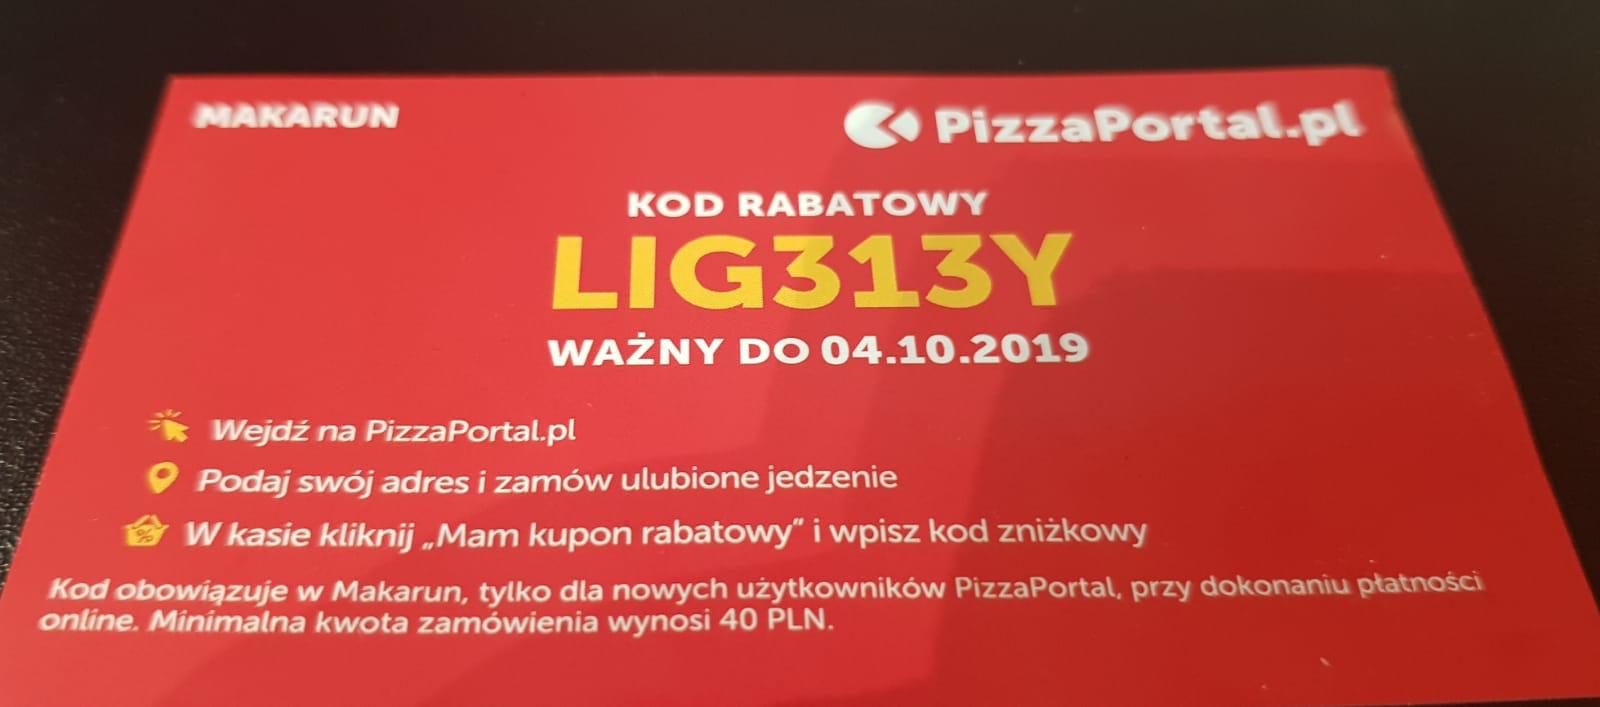 Makarun Łódź 20/40 pizzaportal.pl